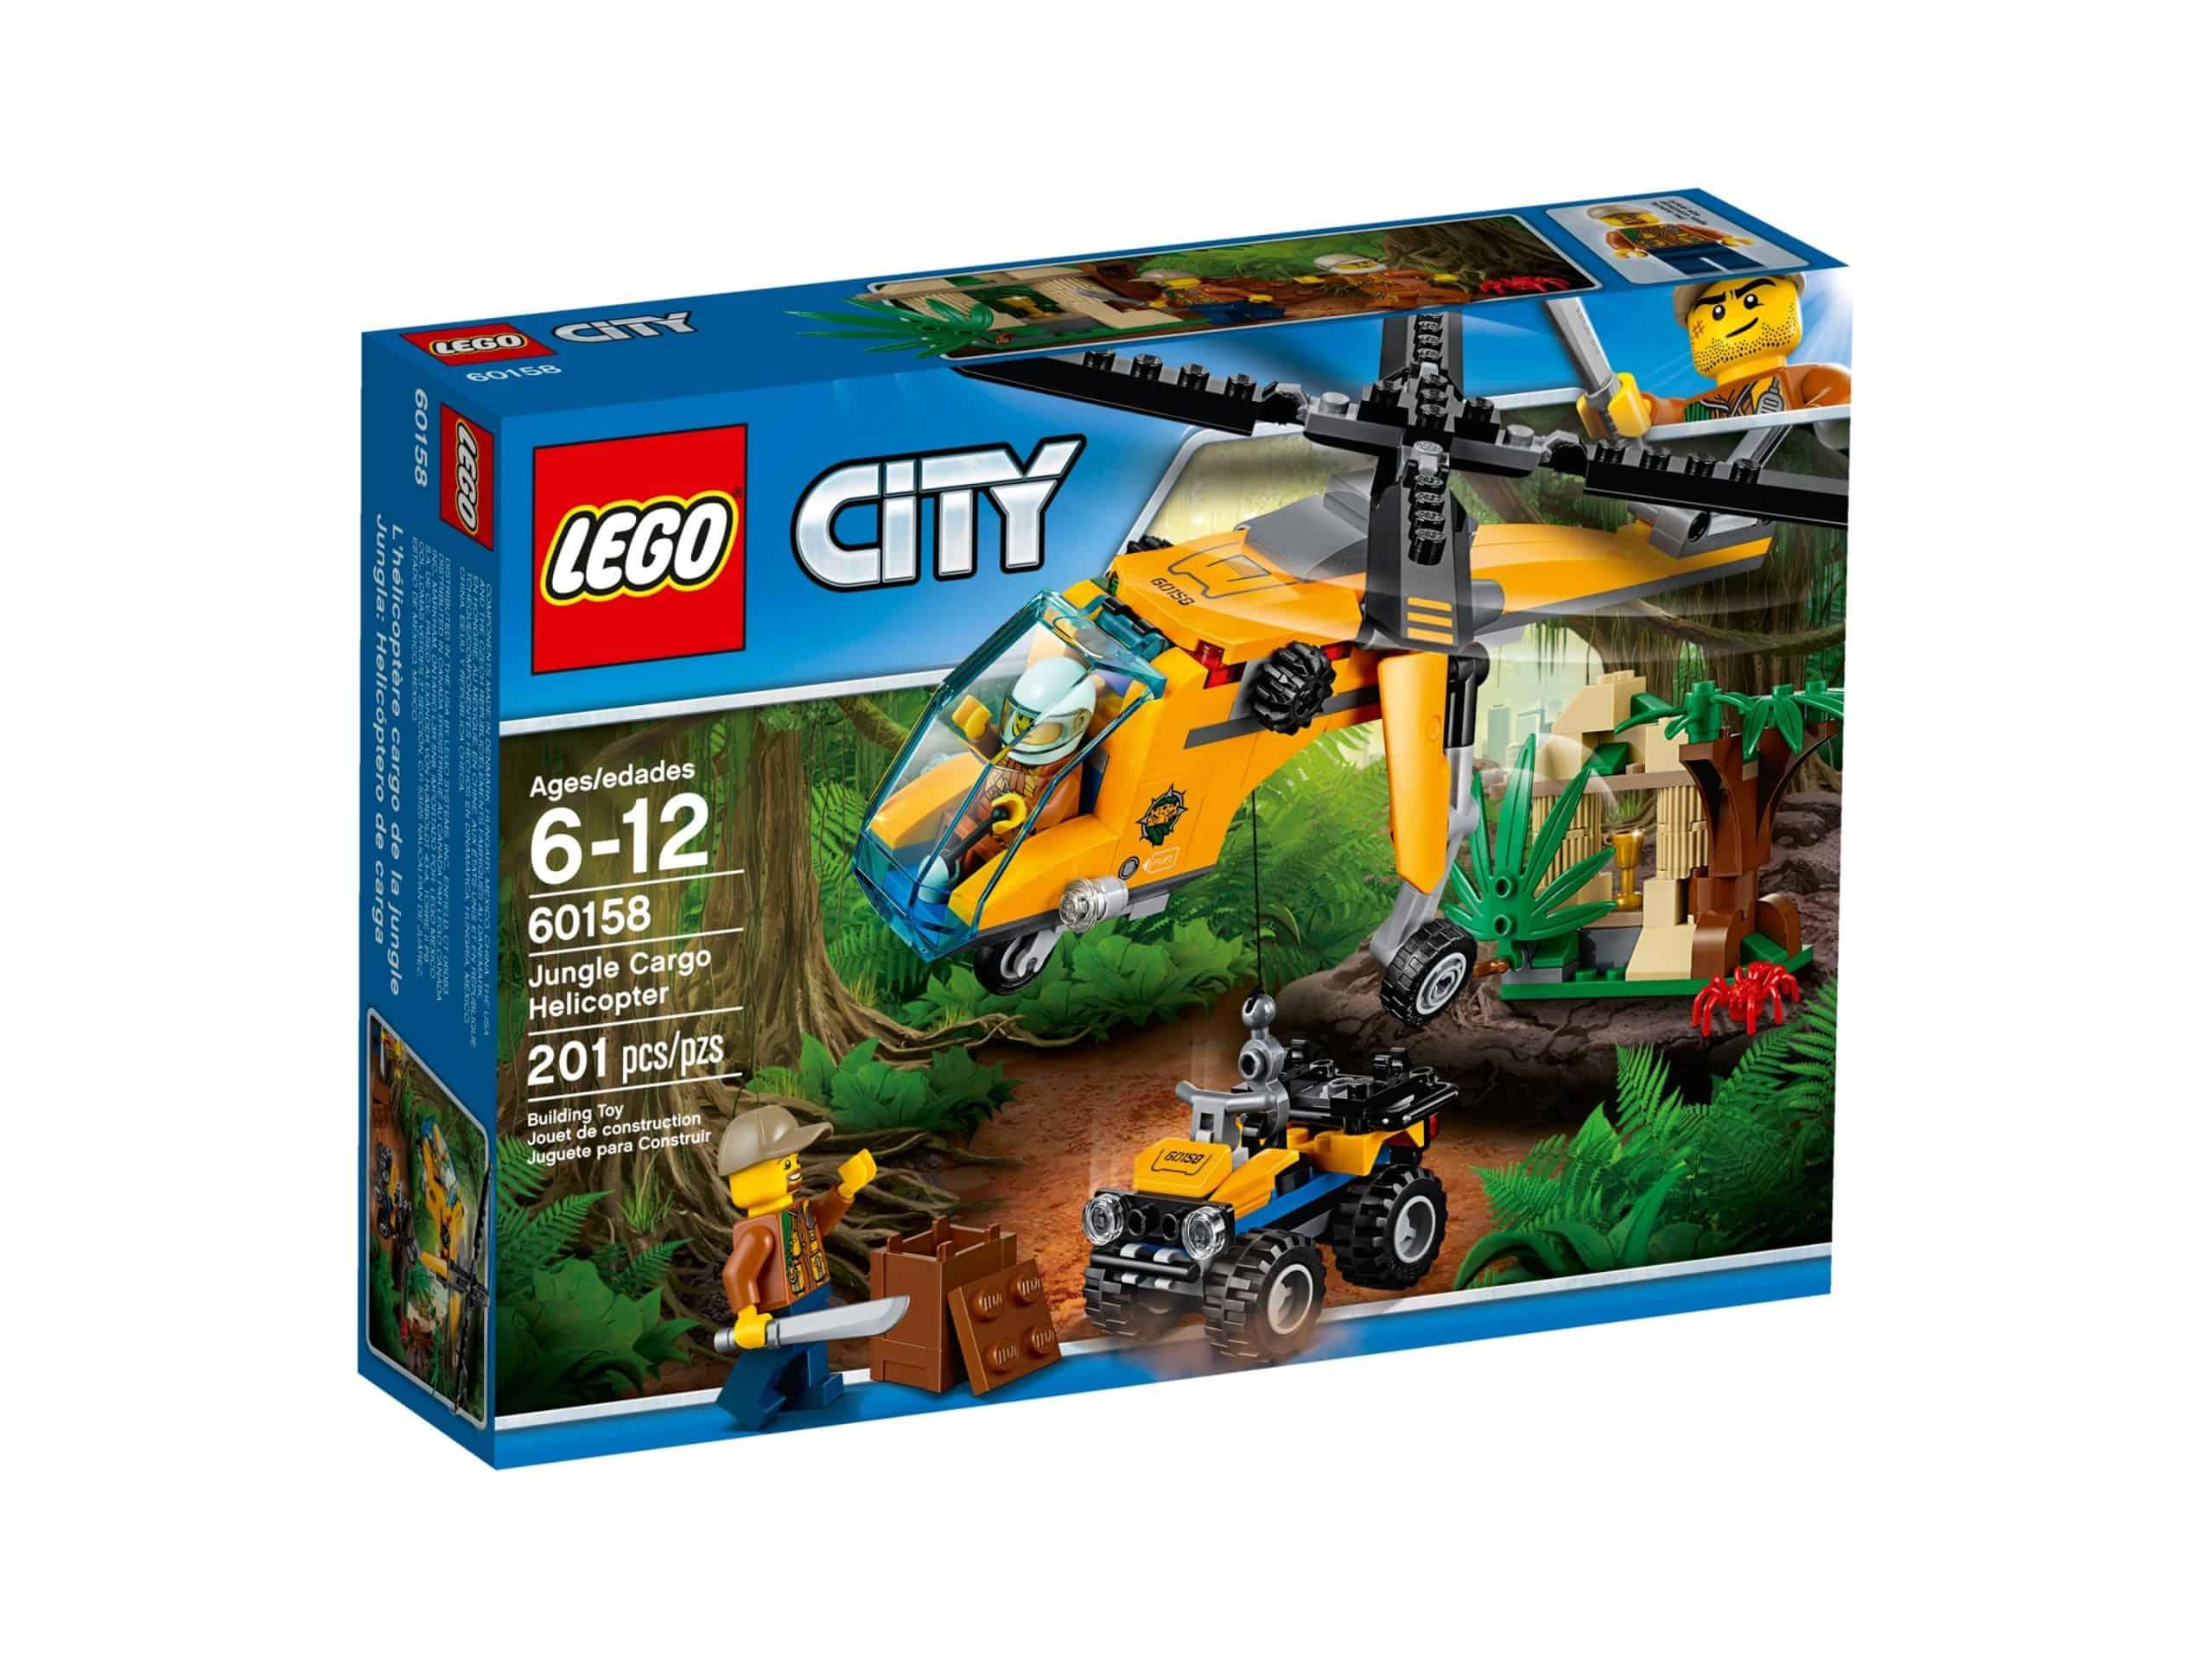 lego 60158 junglefragthelikopter scaled